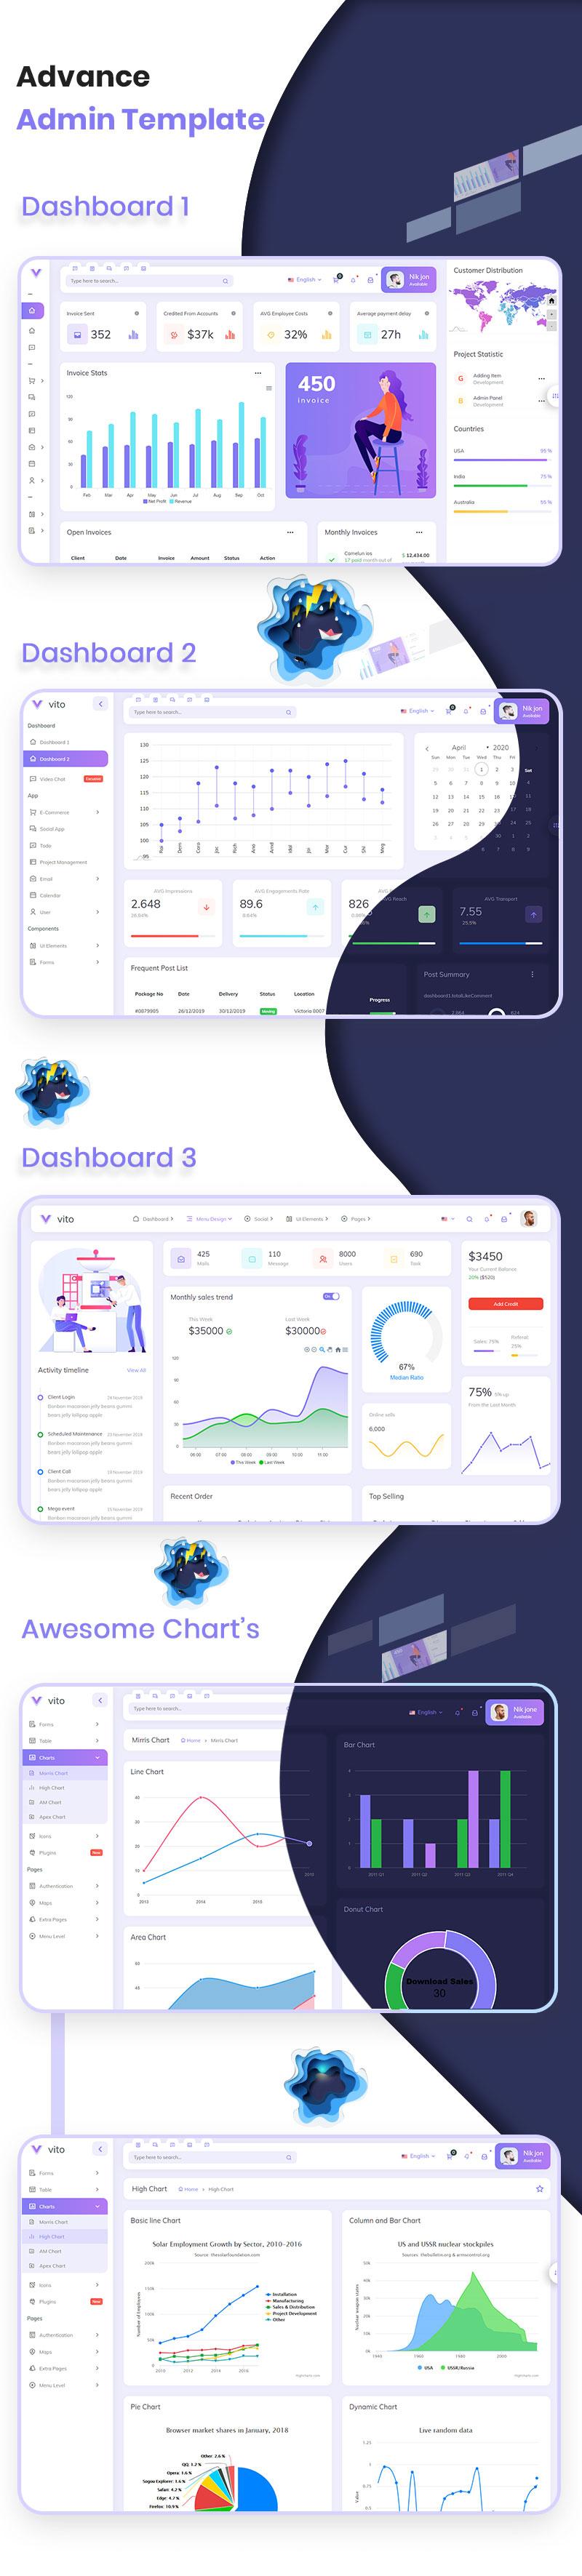 Vuejs React Angular HTML & Laravel Admin Dashboard Template | Vito | Iqonic Design vue laravel html admin dashboard template Vito N1